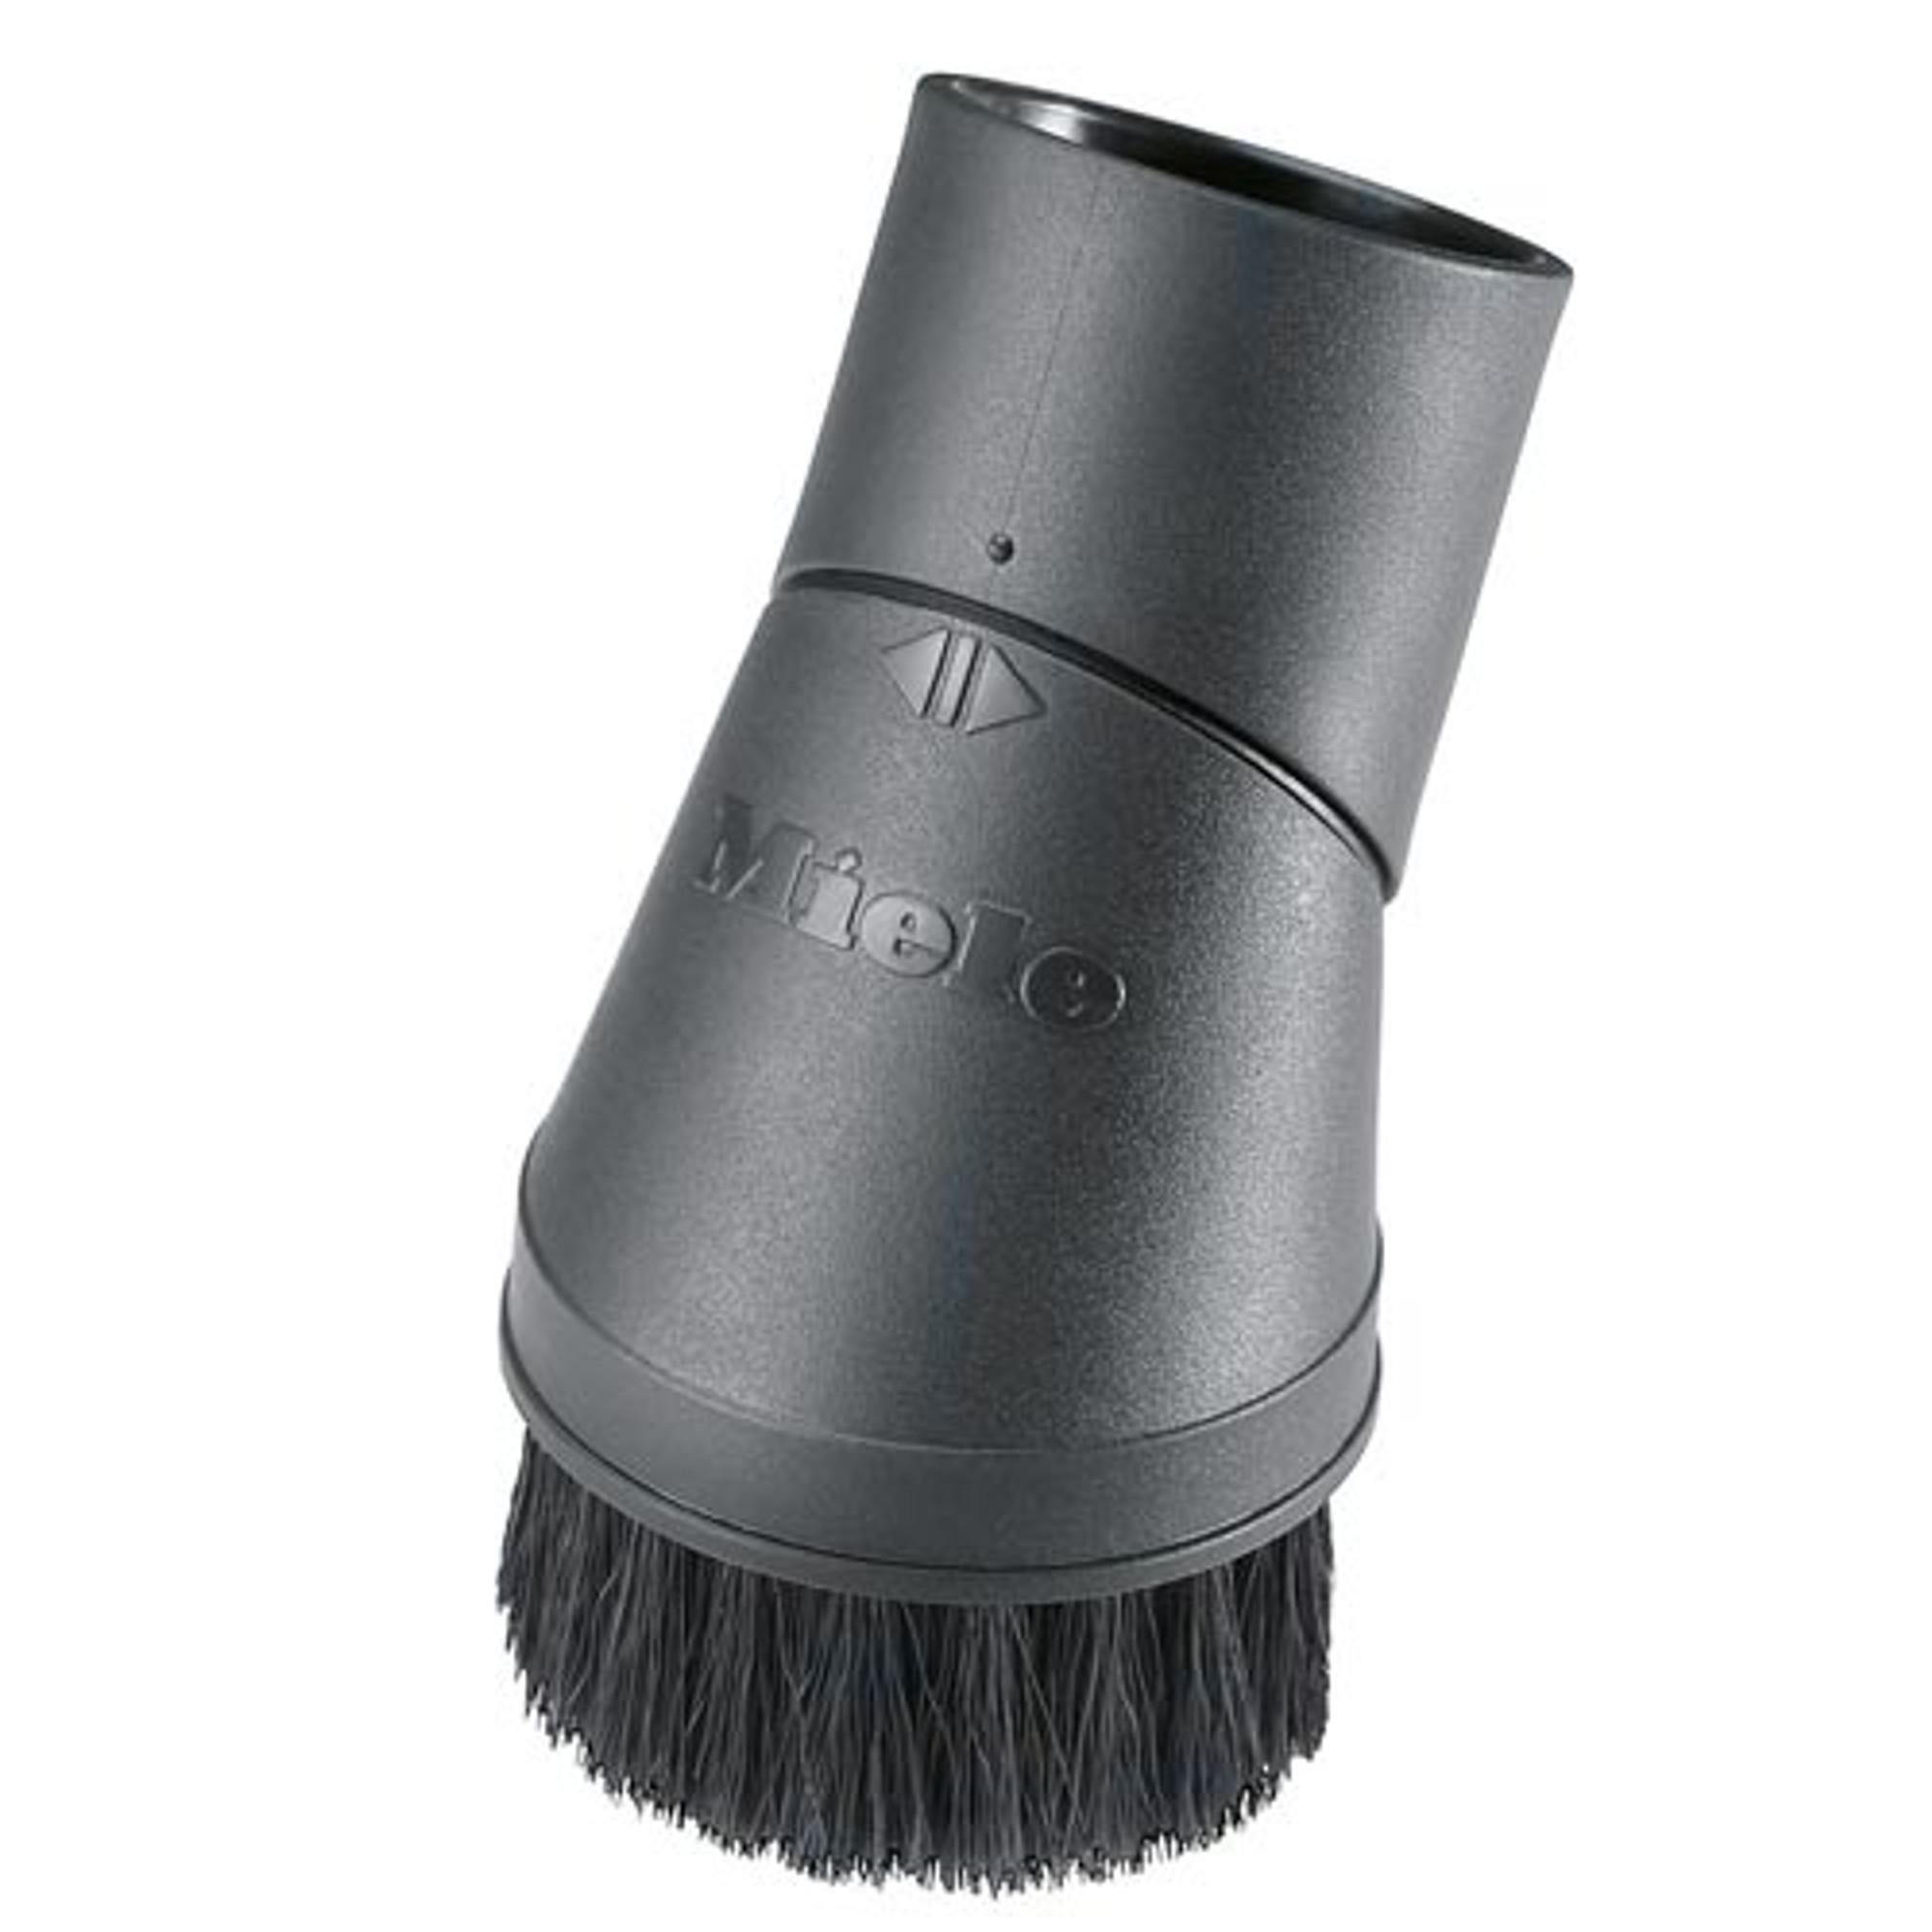 Miele Dust Brush Vacuum Cleaner Attachment